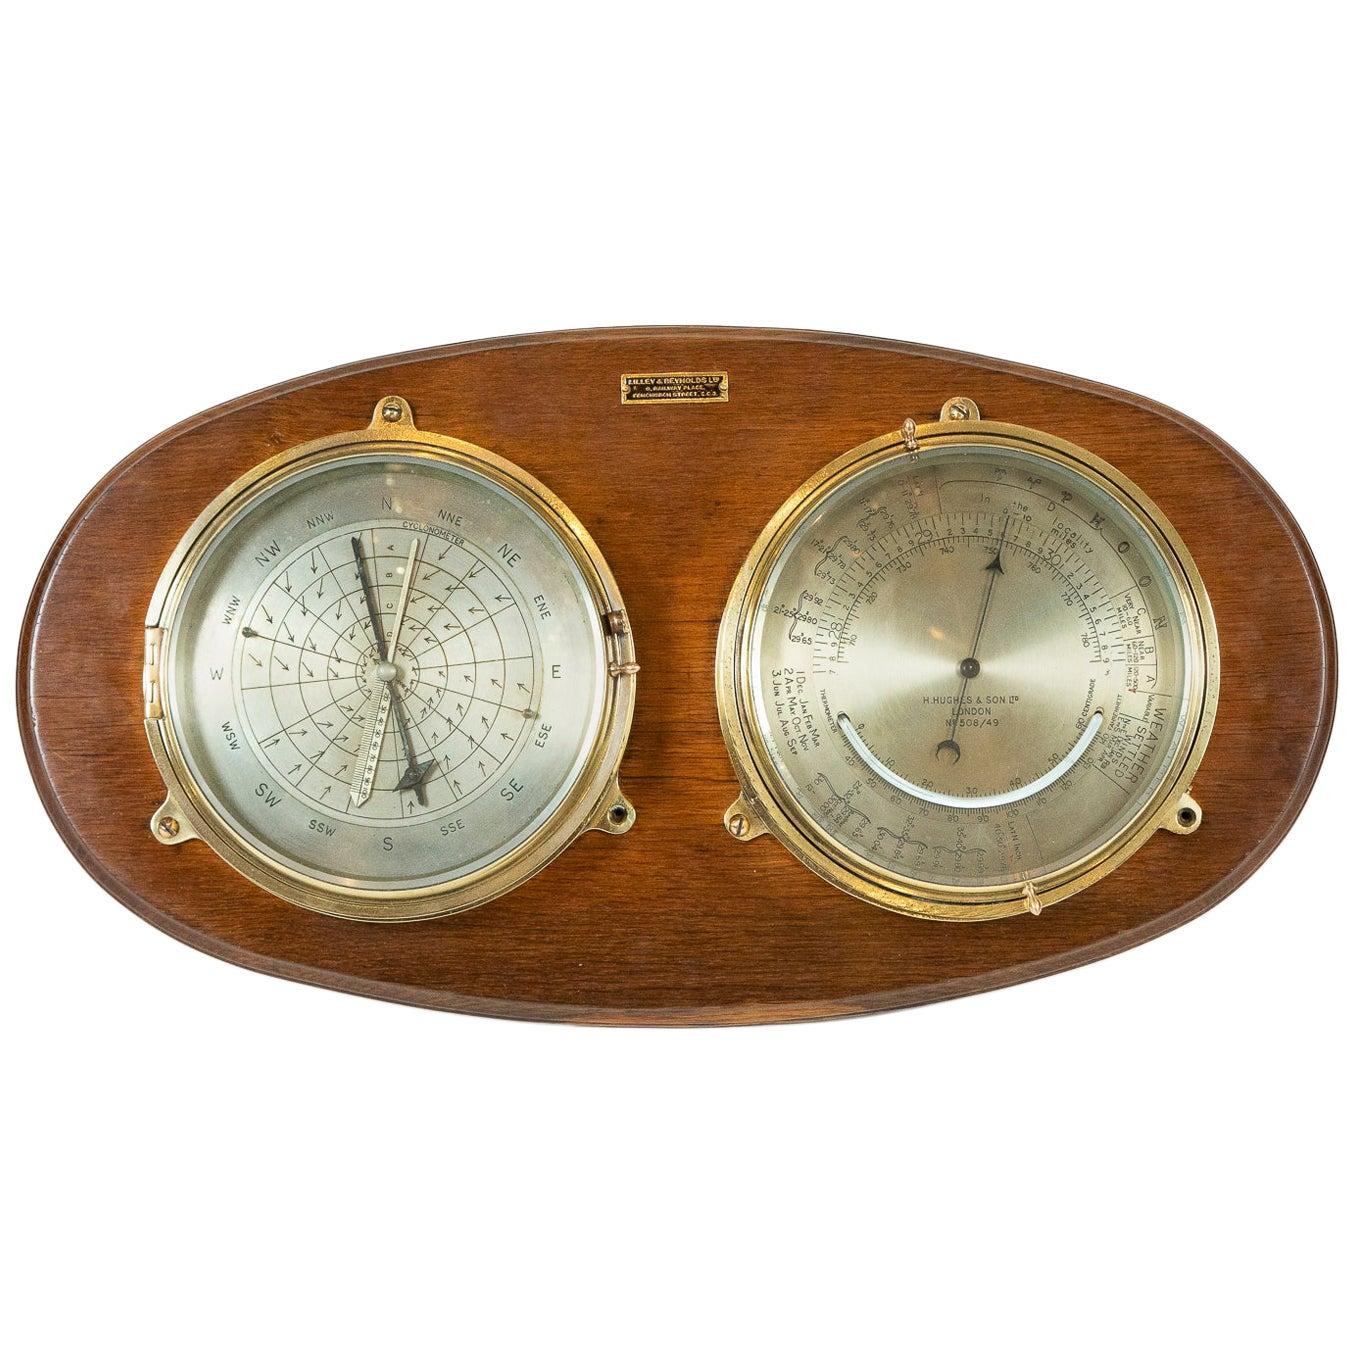 Rare Barocyclonometer by Henry Hughes & Son of London